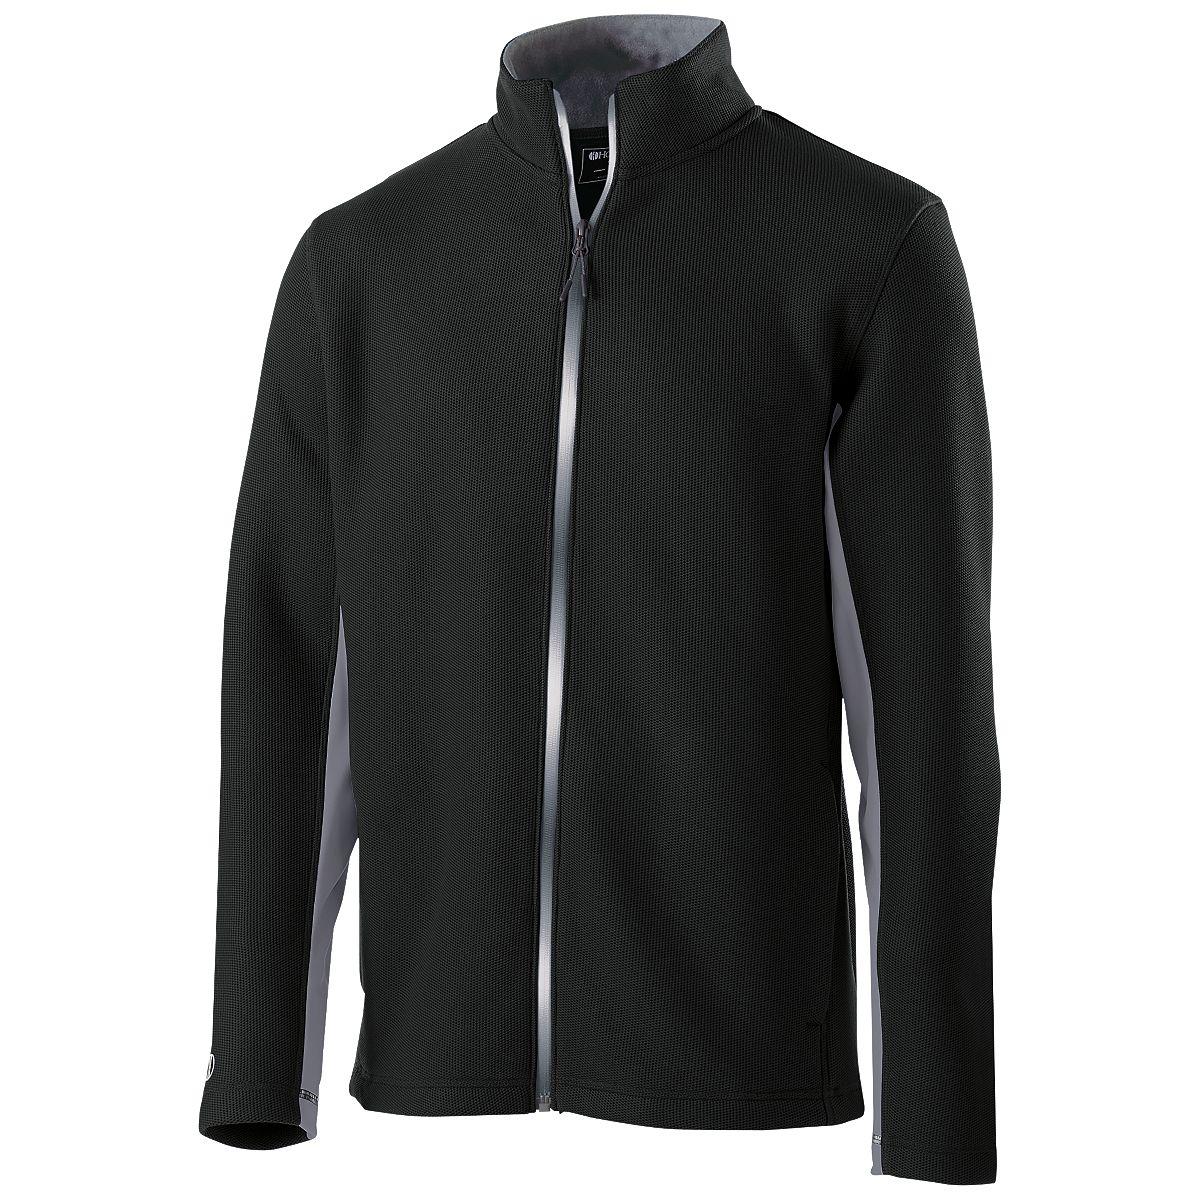 Holloway Invert Jacket Bk/Carb M - image 1 of 1